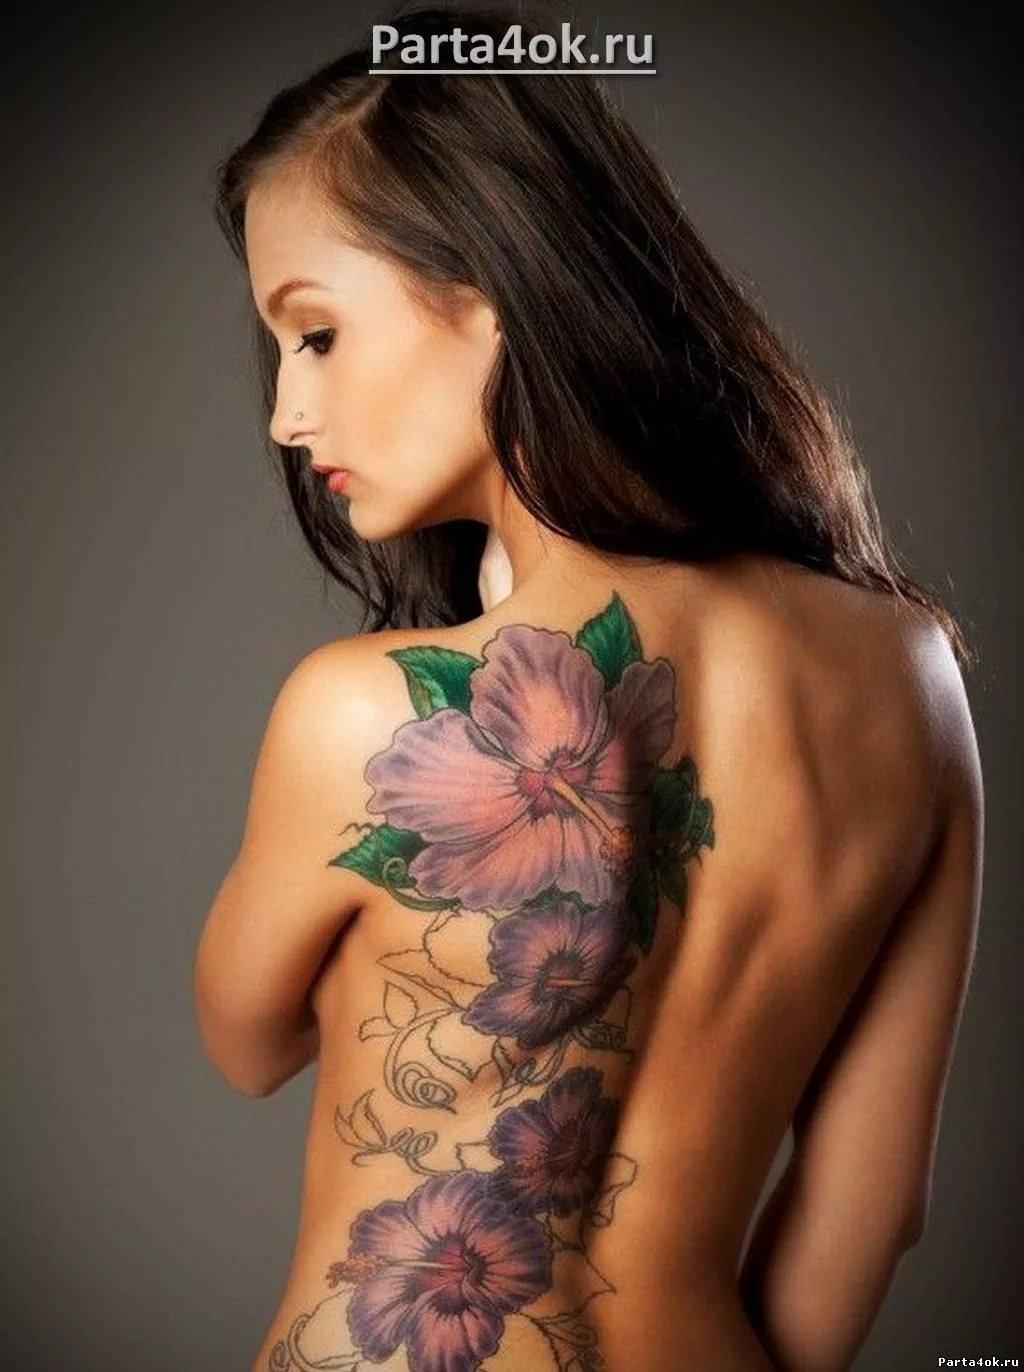 Фото татуировка на женском теле